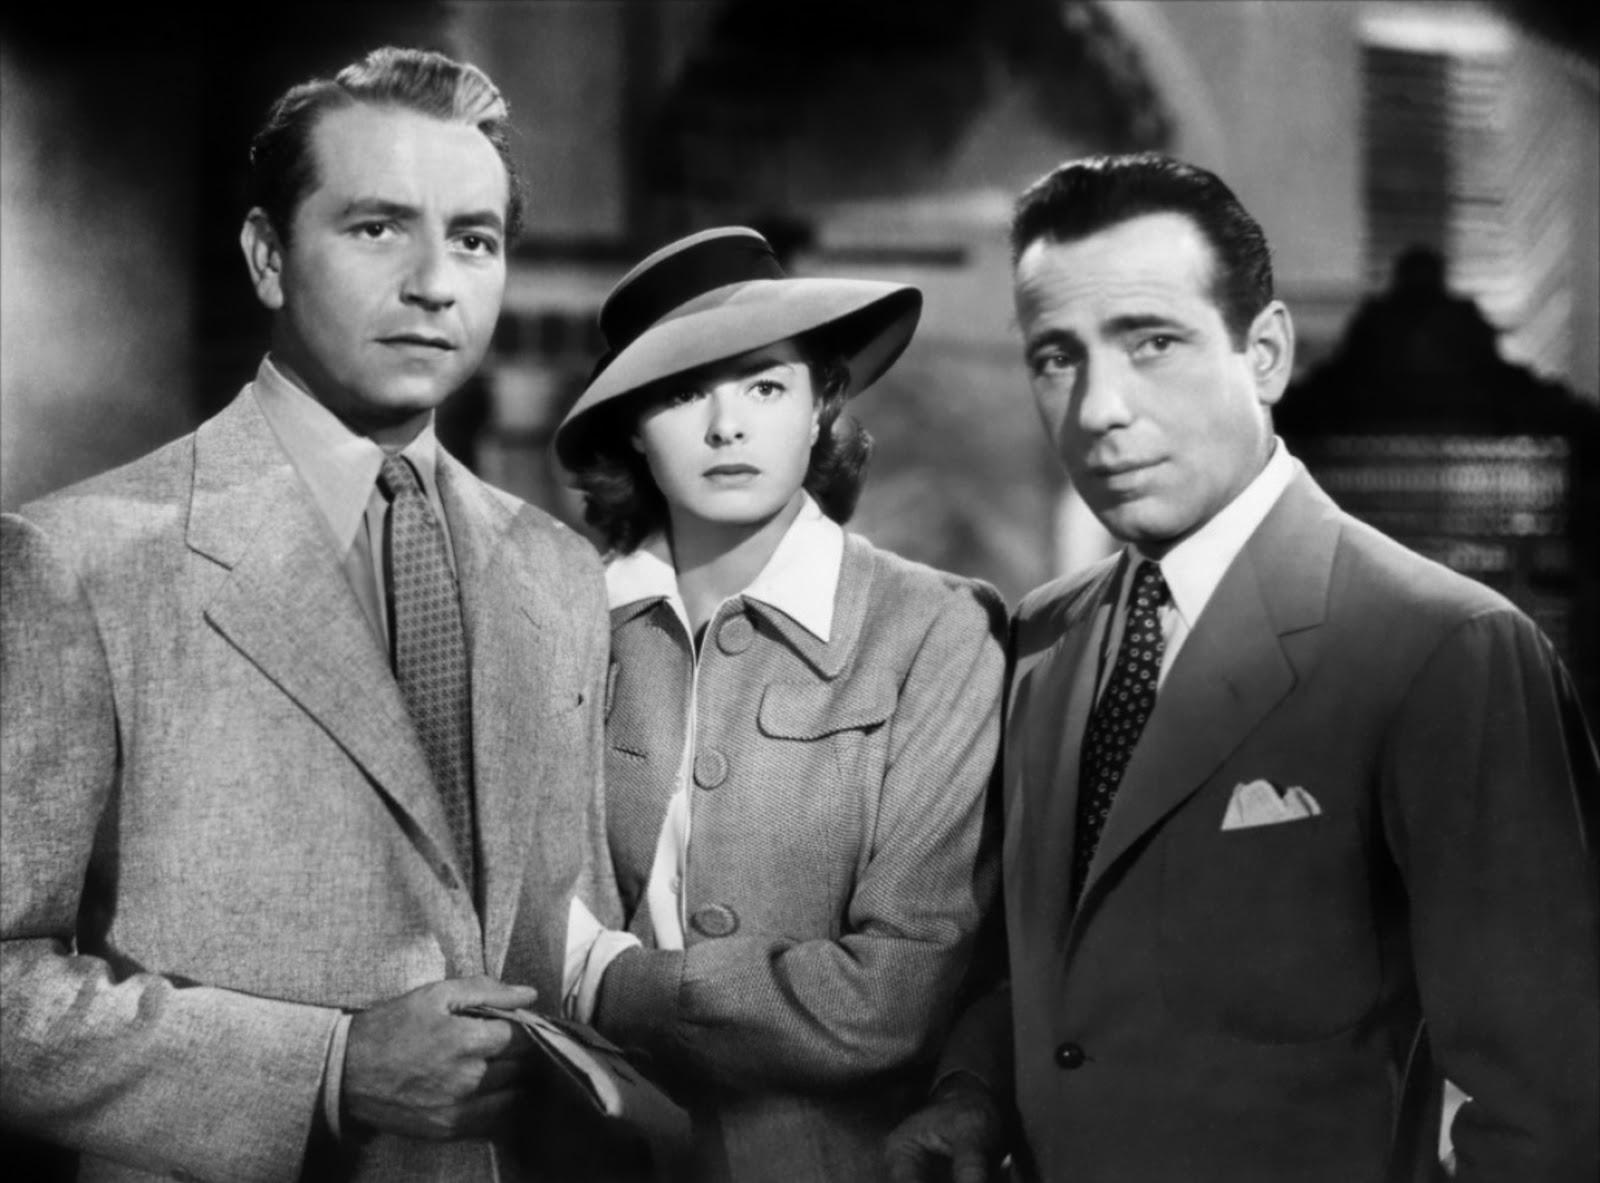 Casablanca (1942), starring Ingrid Bergman, Humphrey Bogart, directed by Michael Curtiz